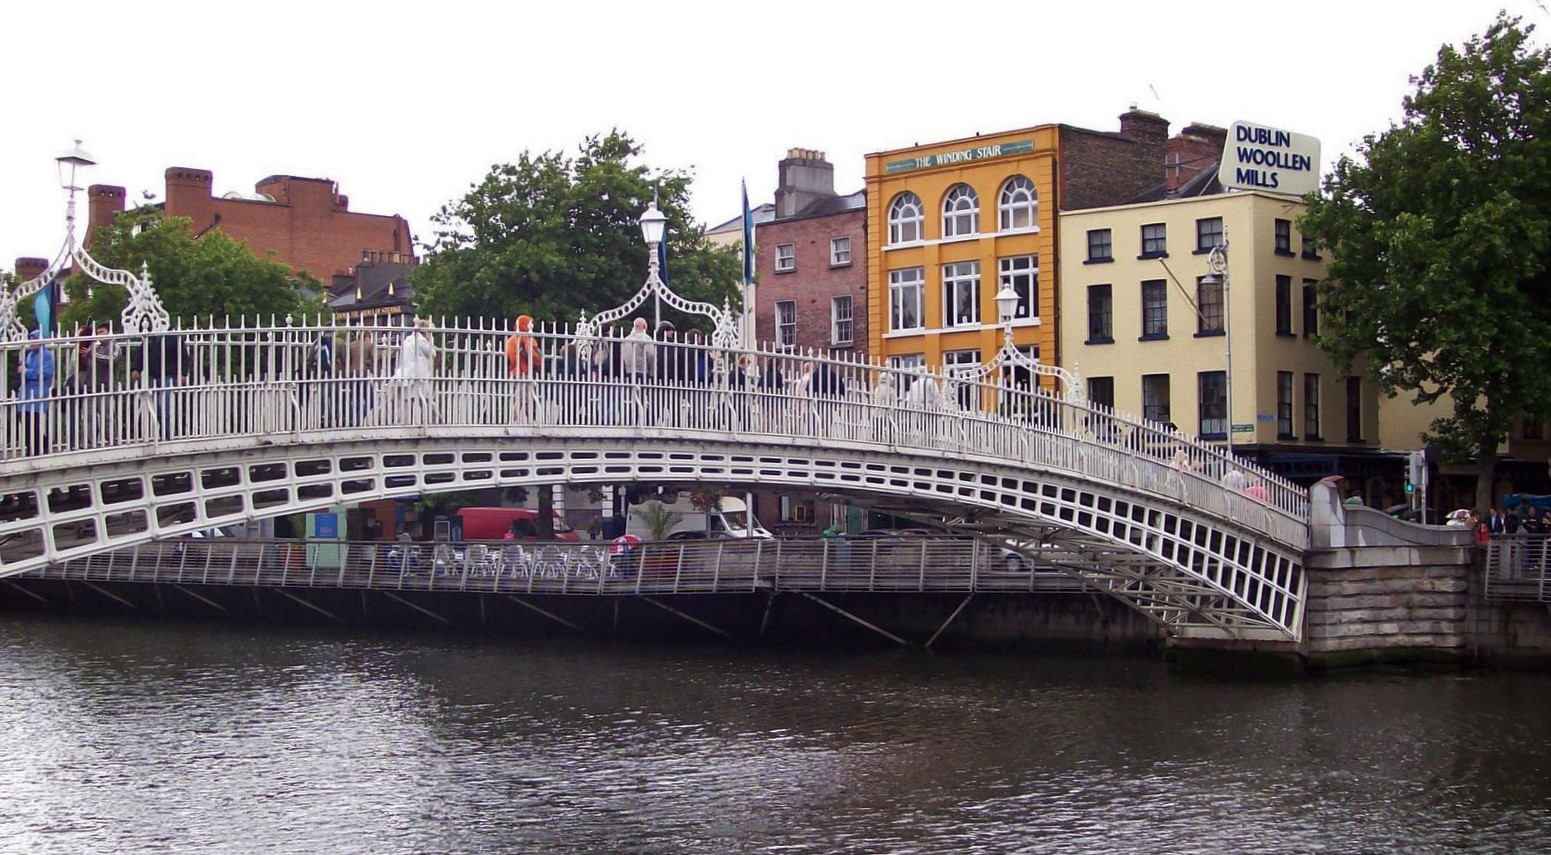 Halfpenny Bridge über Dublins Fluss Liffey